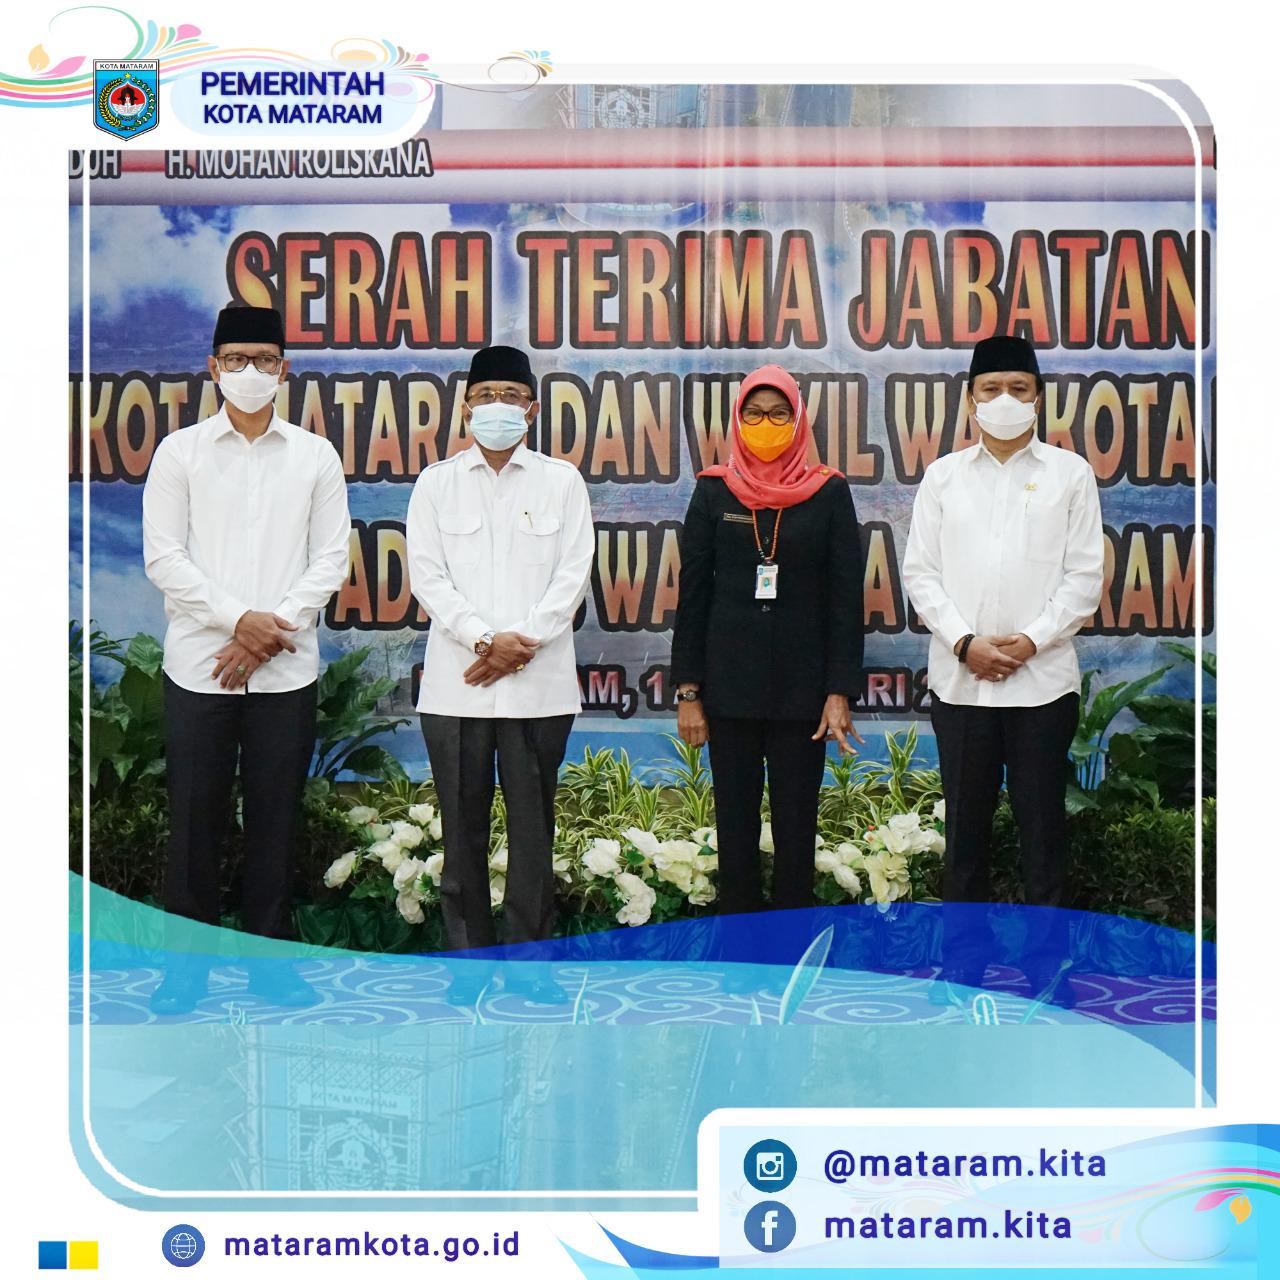 Serah Terima Jabatan Wali Kota Mataram Periode 2016-2021 ke PLH Wali Kota Mataram